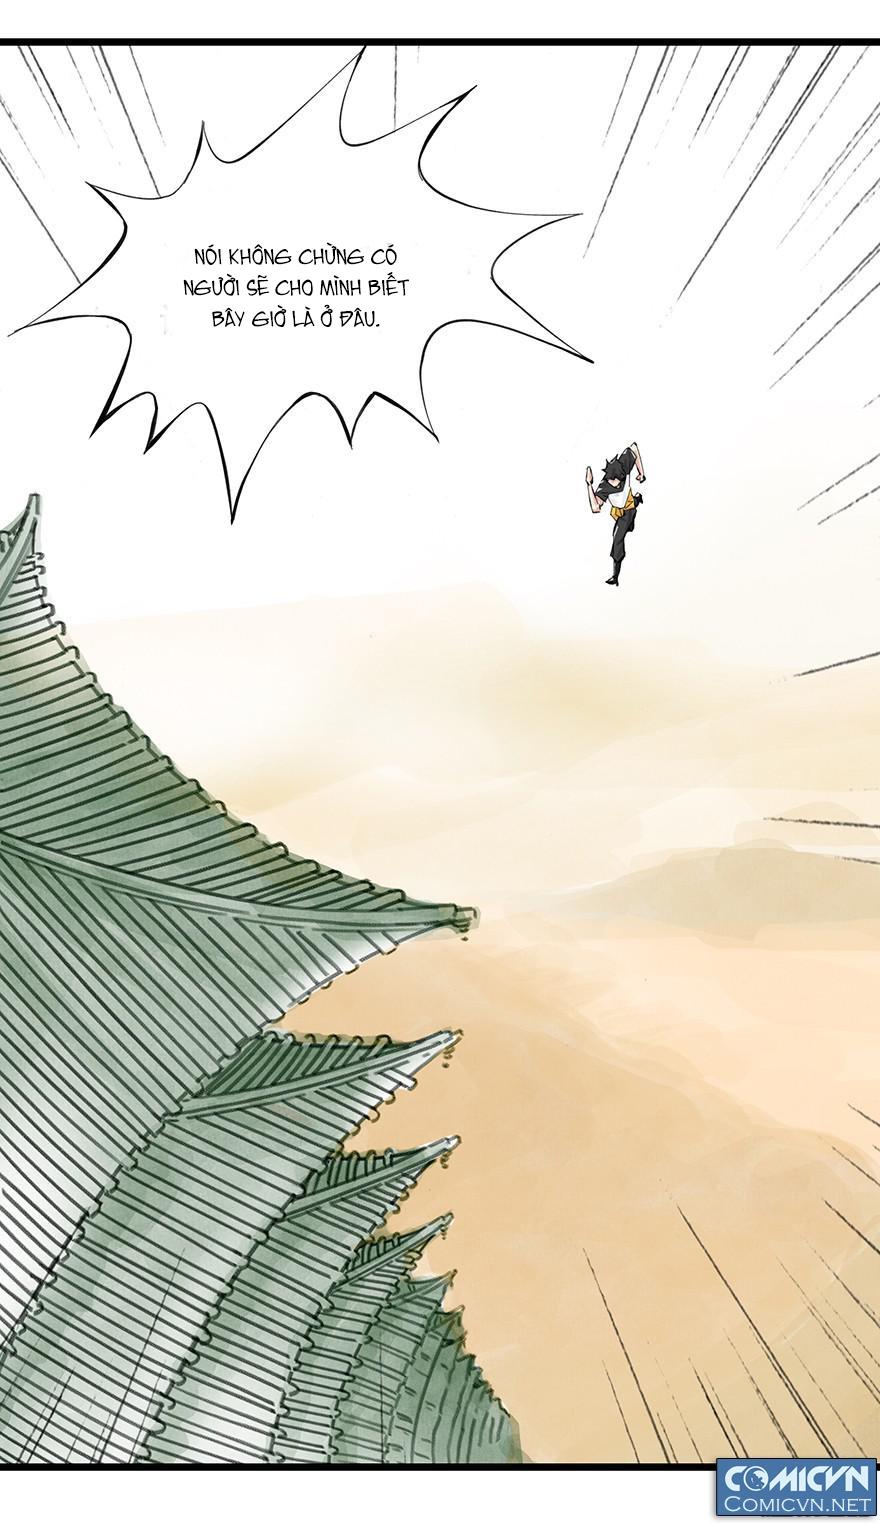 Tháp Trăm Tầng Chapter 1 - Hamtruyen.vn